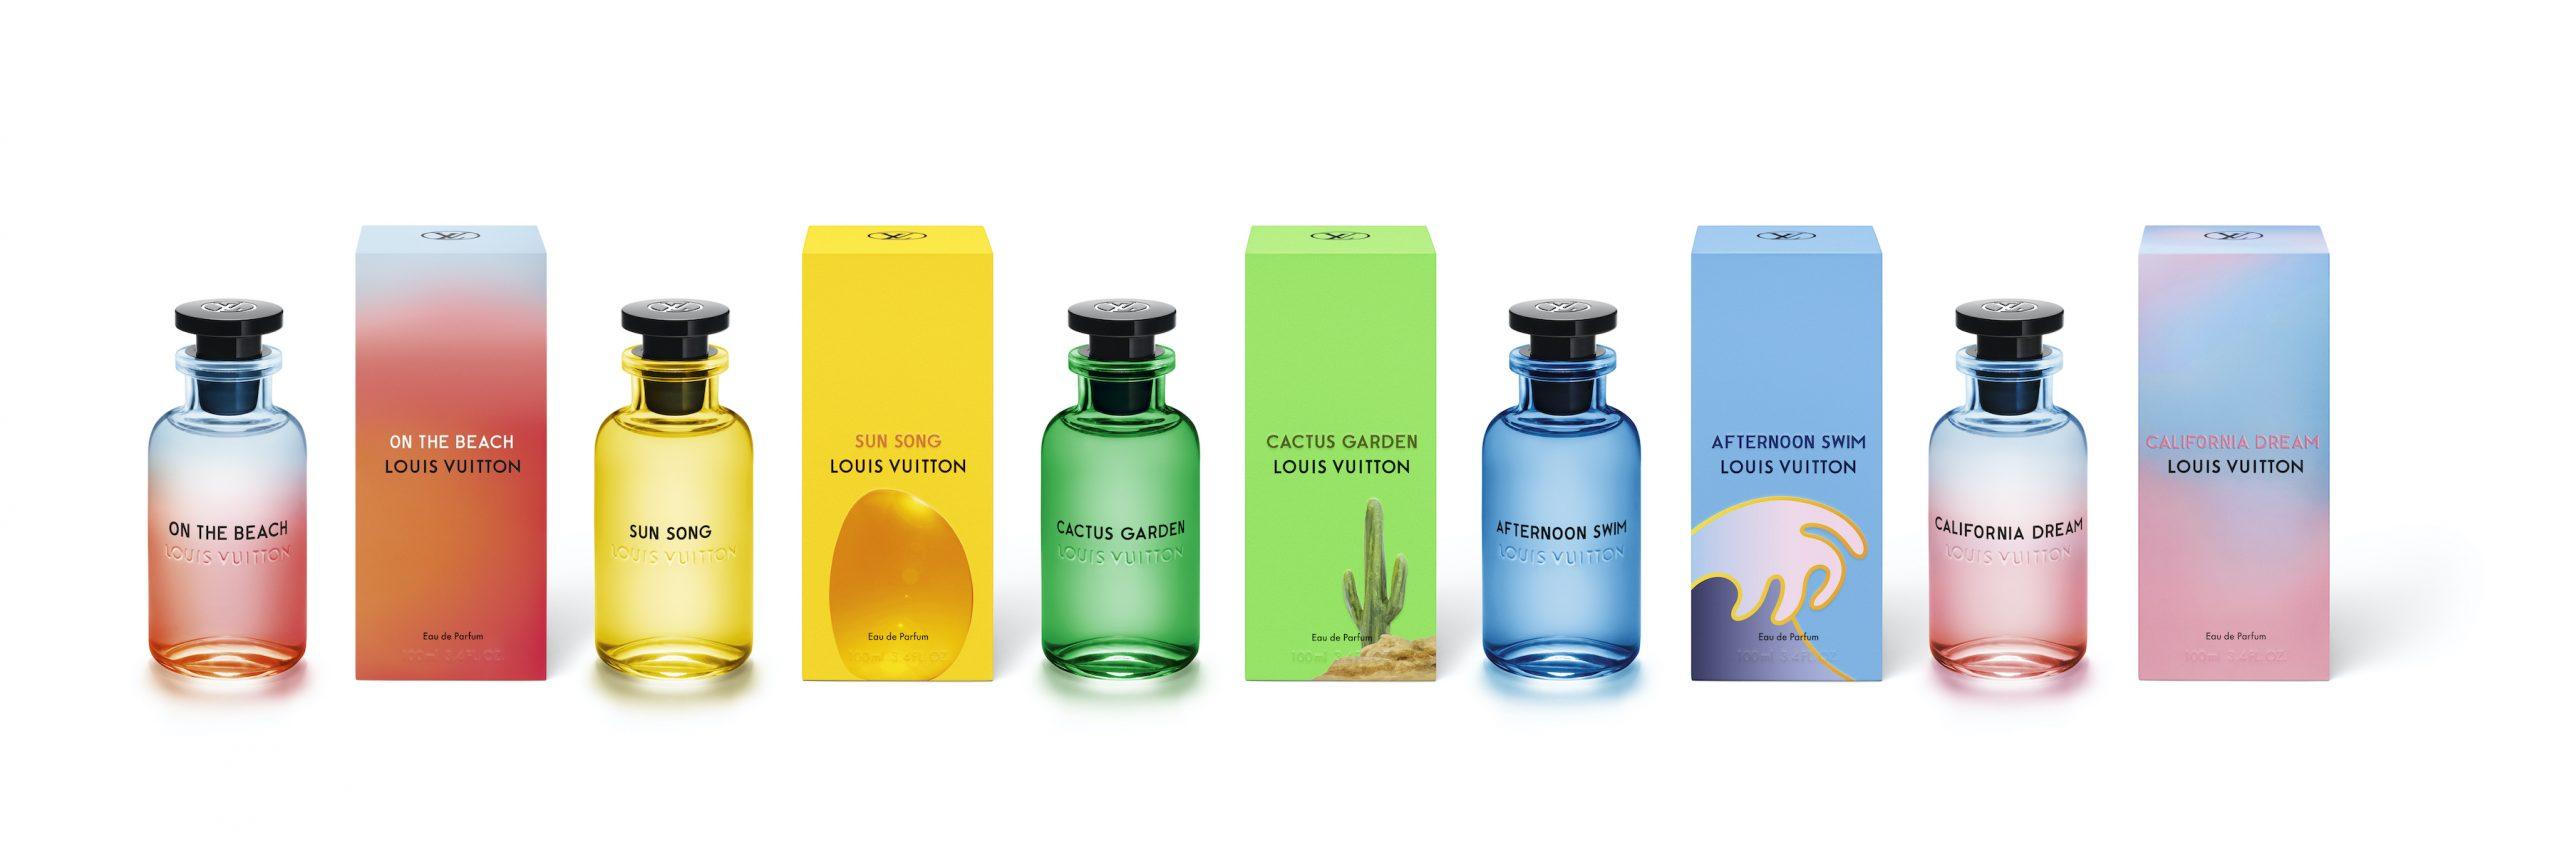 On The Beach - Louis Vuitton - Nuova Fragranza